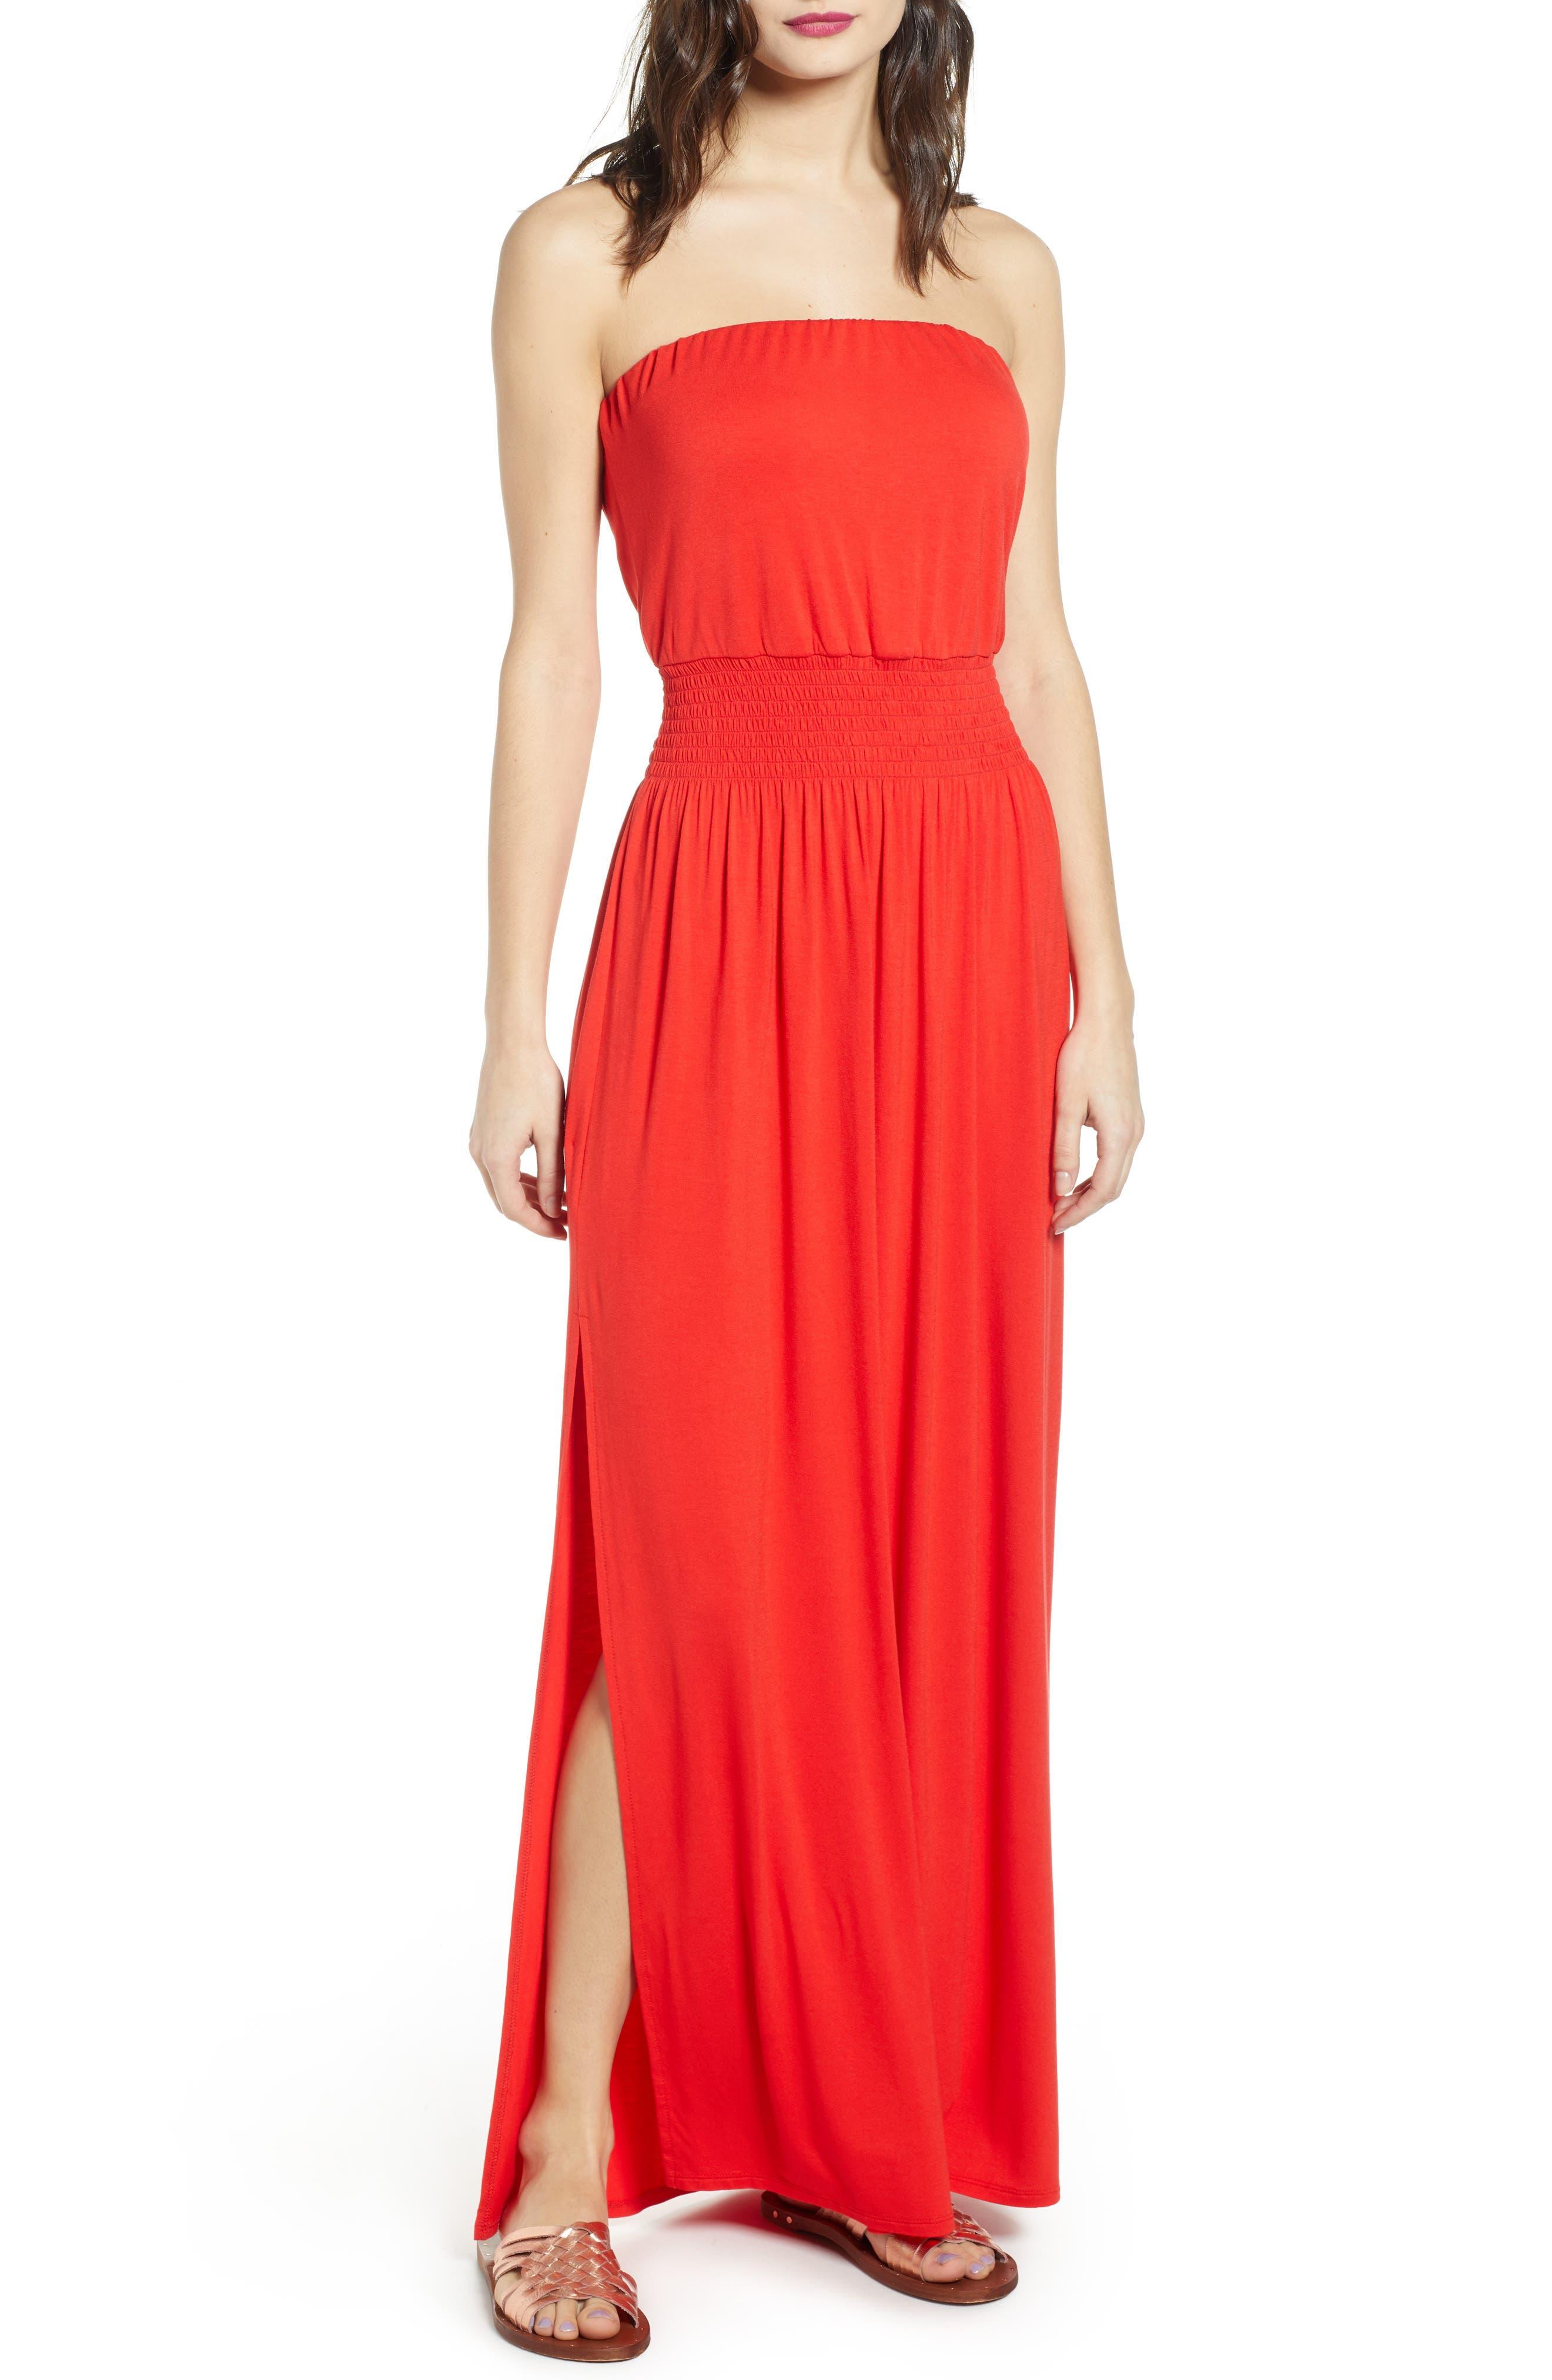 Bp. Strapless Maxi Dress, Red